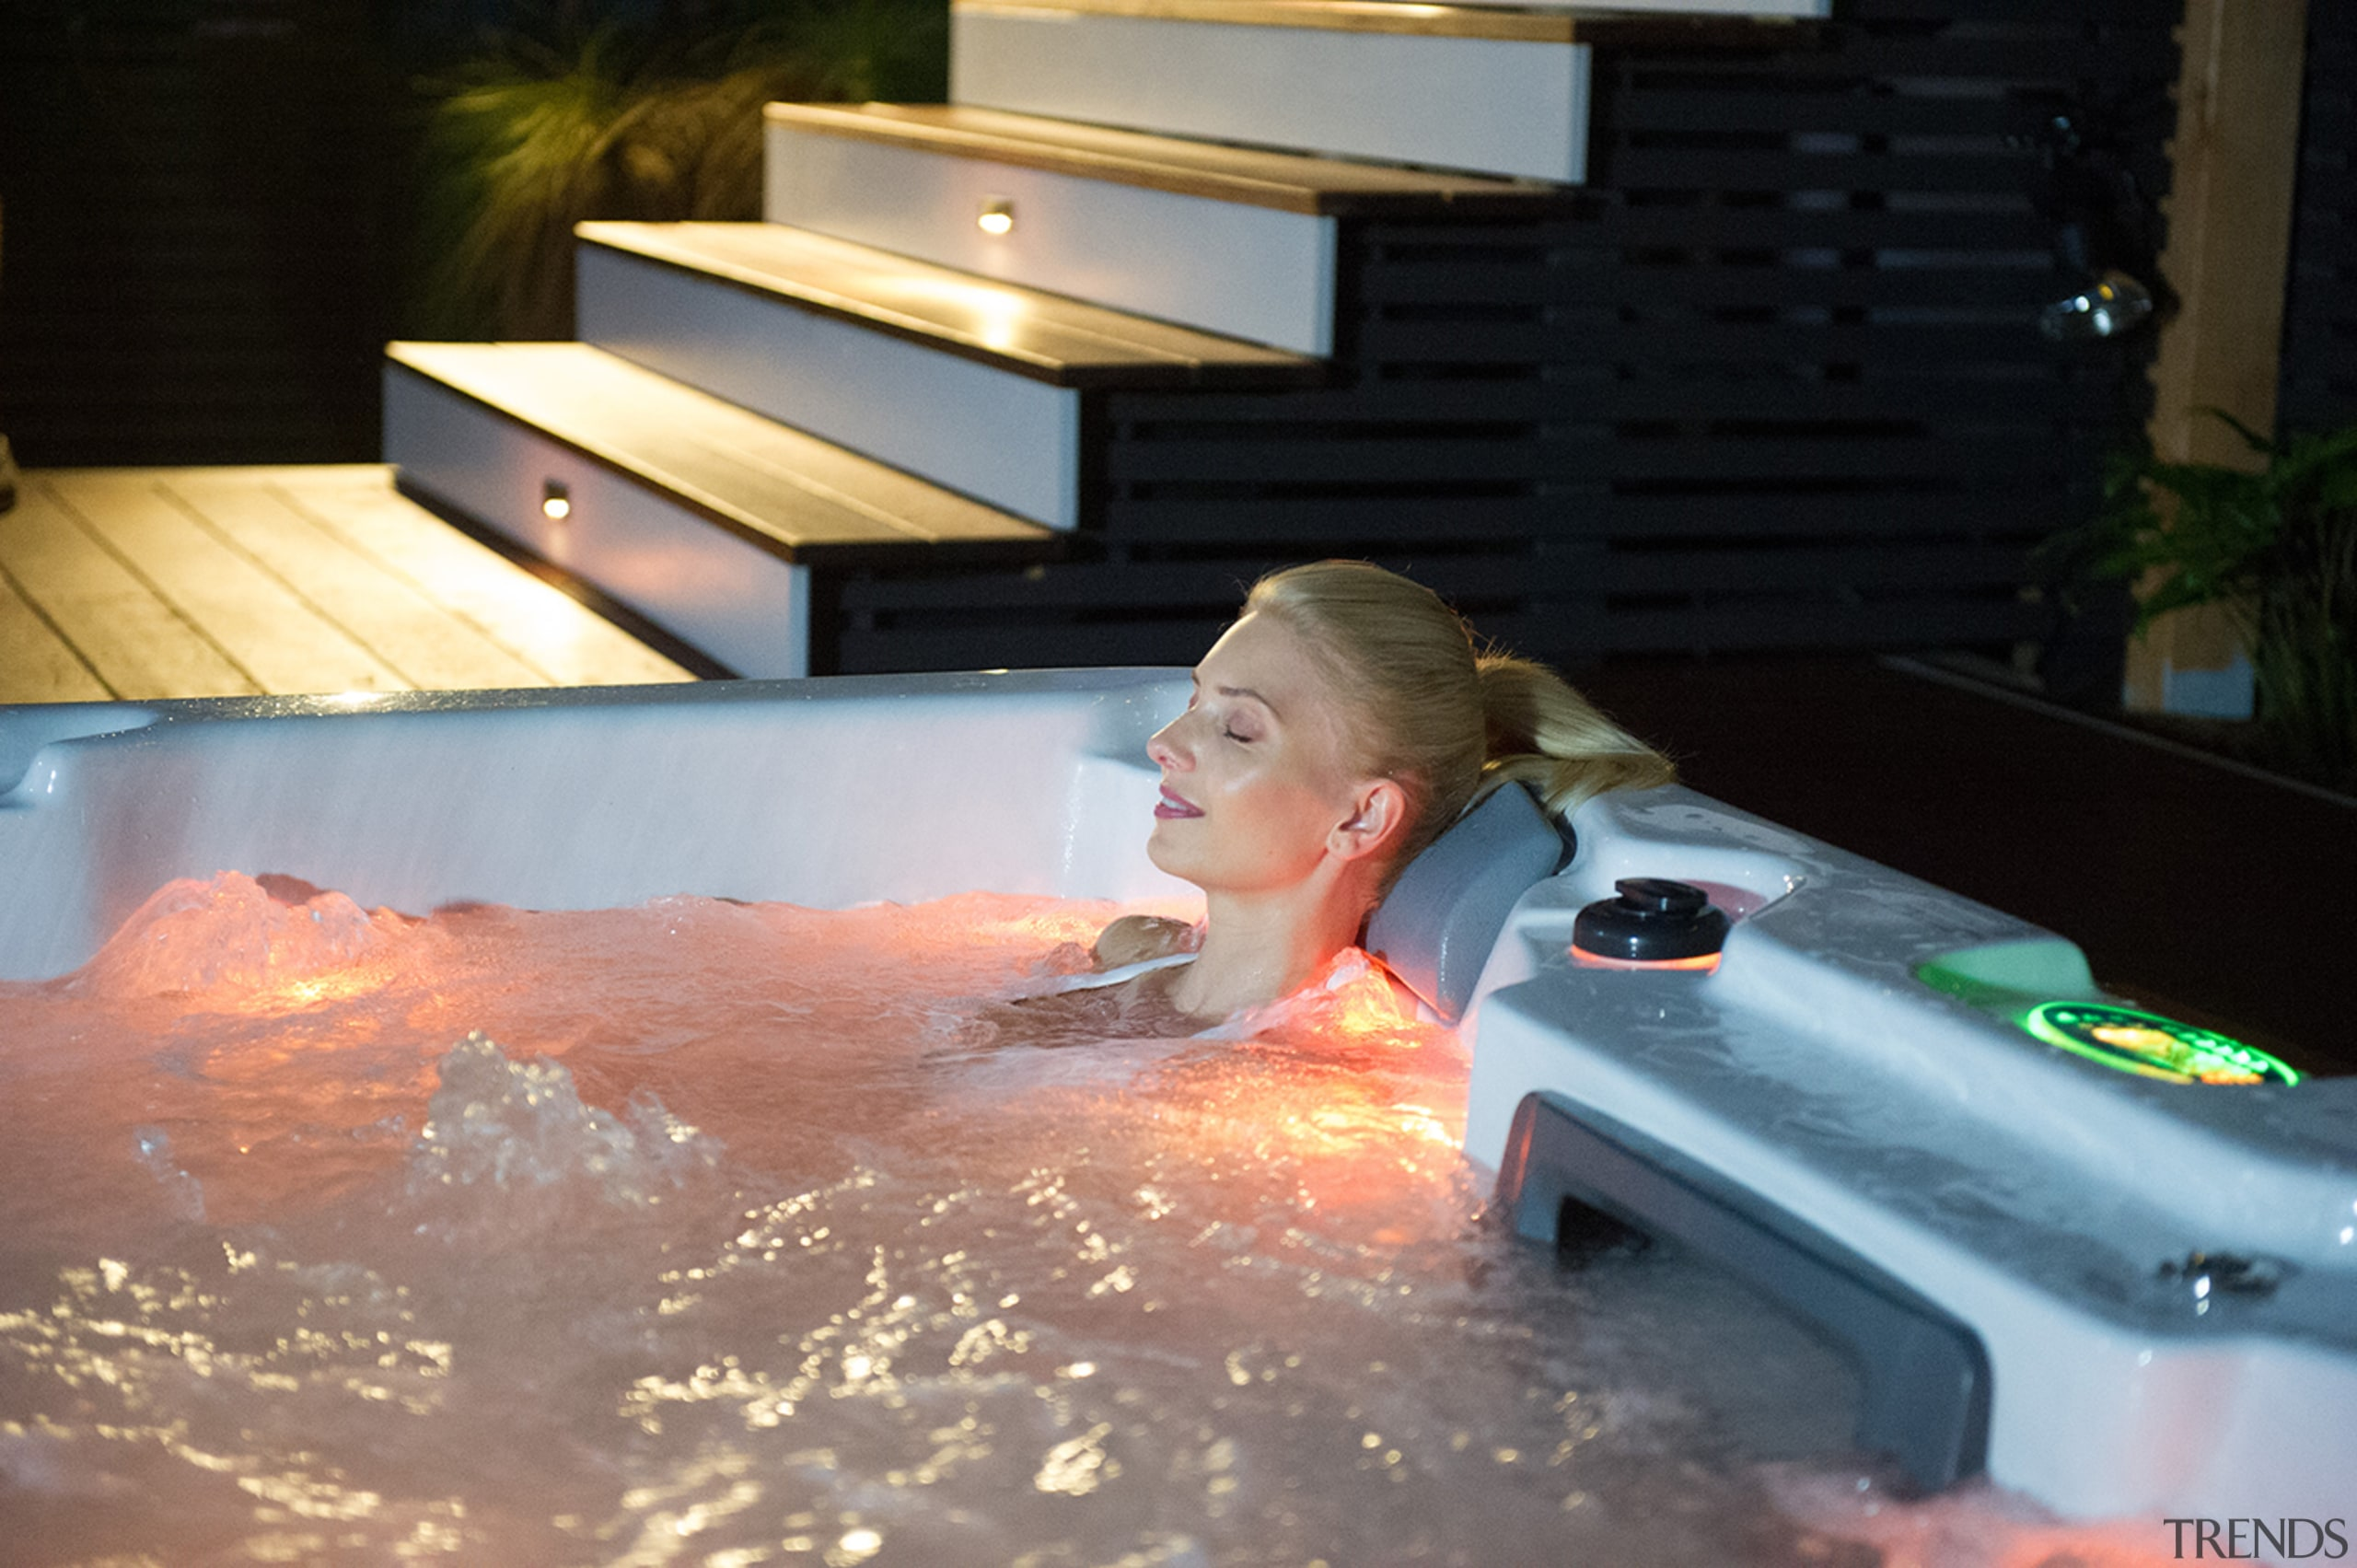 Oasis 096 - bathtub   fun   hot bathtub, fun, hot tub, jacuzzi, leisure, swimming pool, water, black, gray